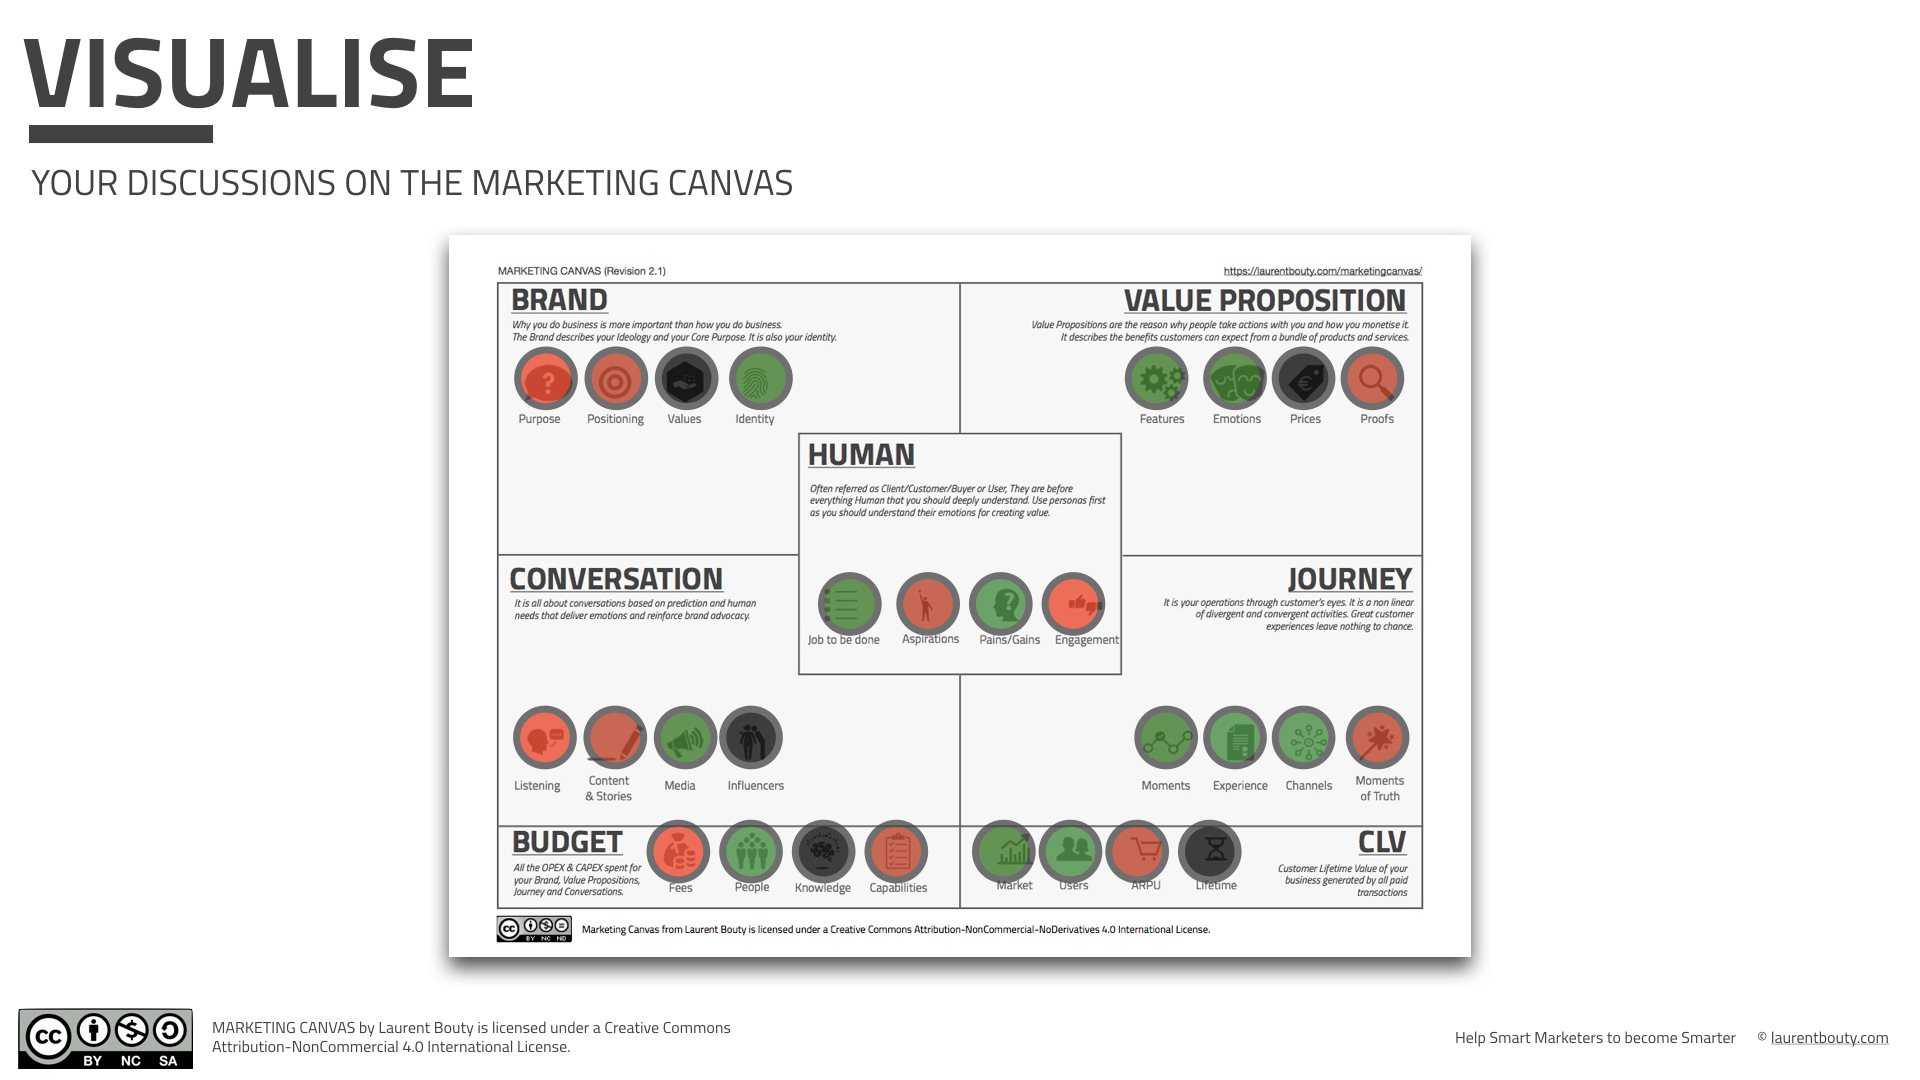 Laurent-Bouty-Marketing-Canvas-Methodology-Visualisation.jpeg